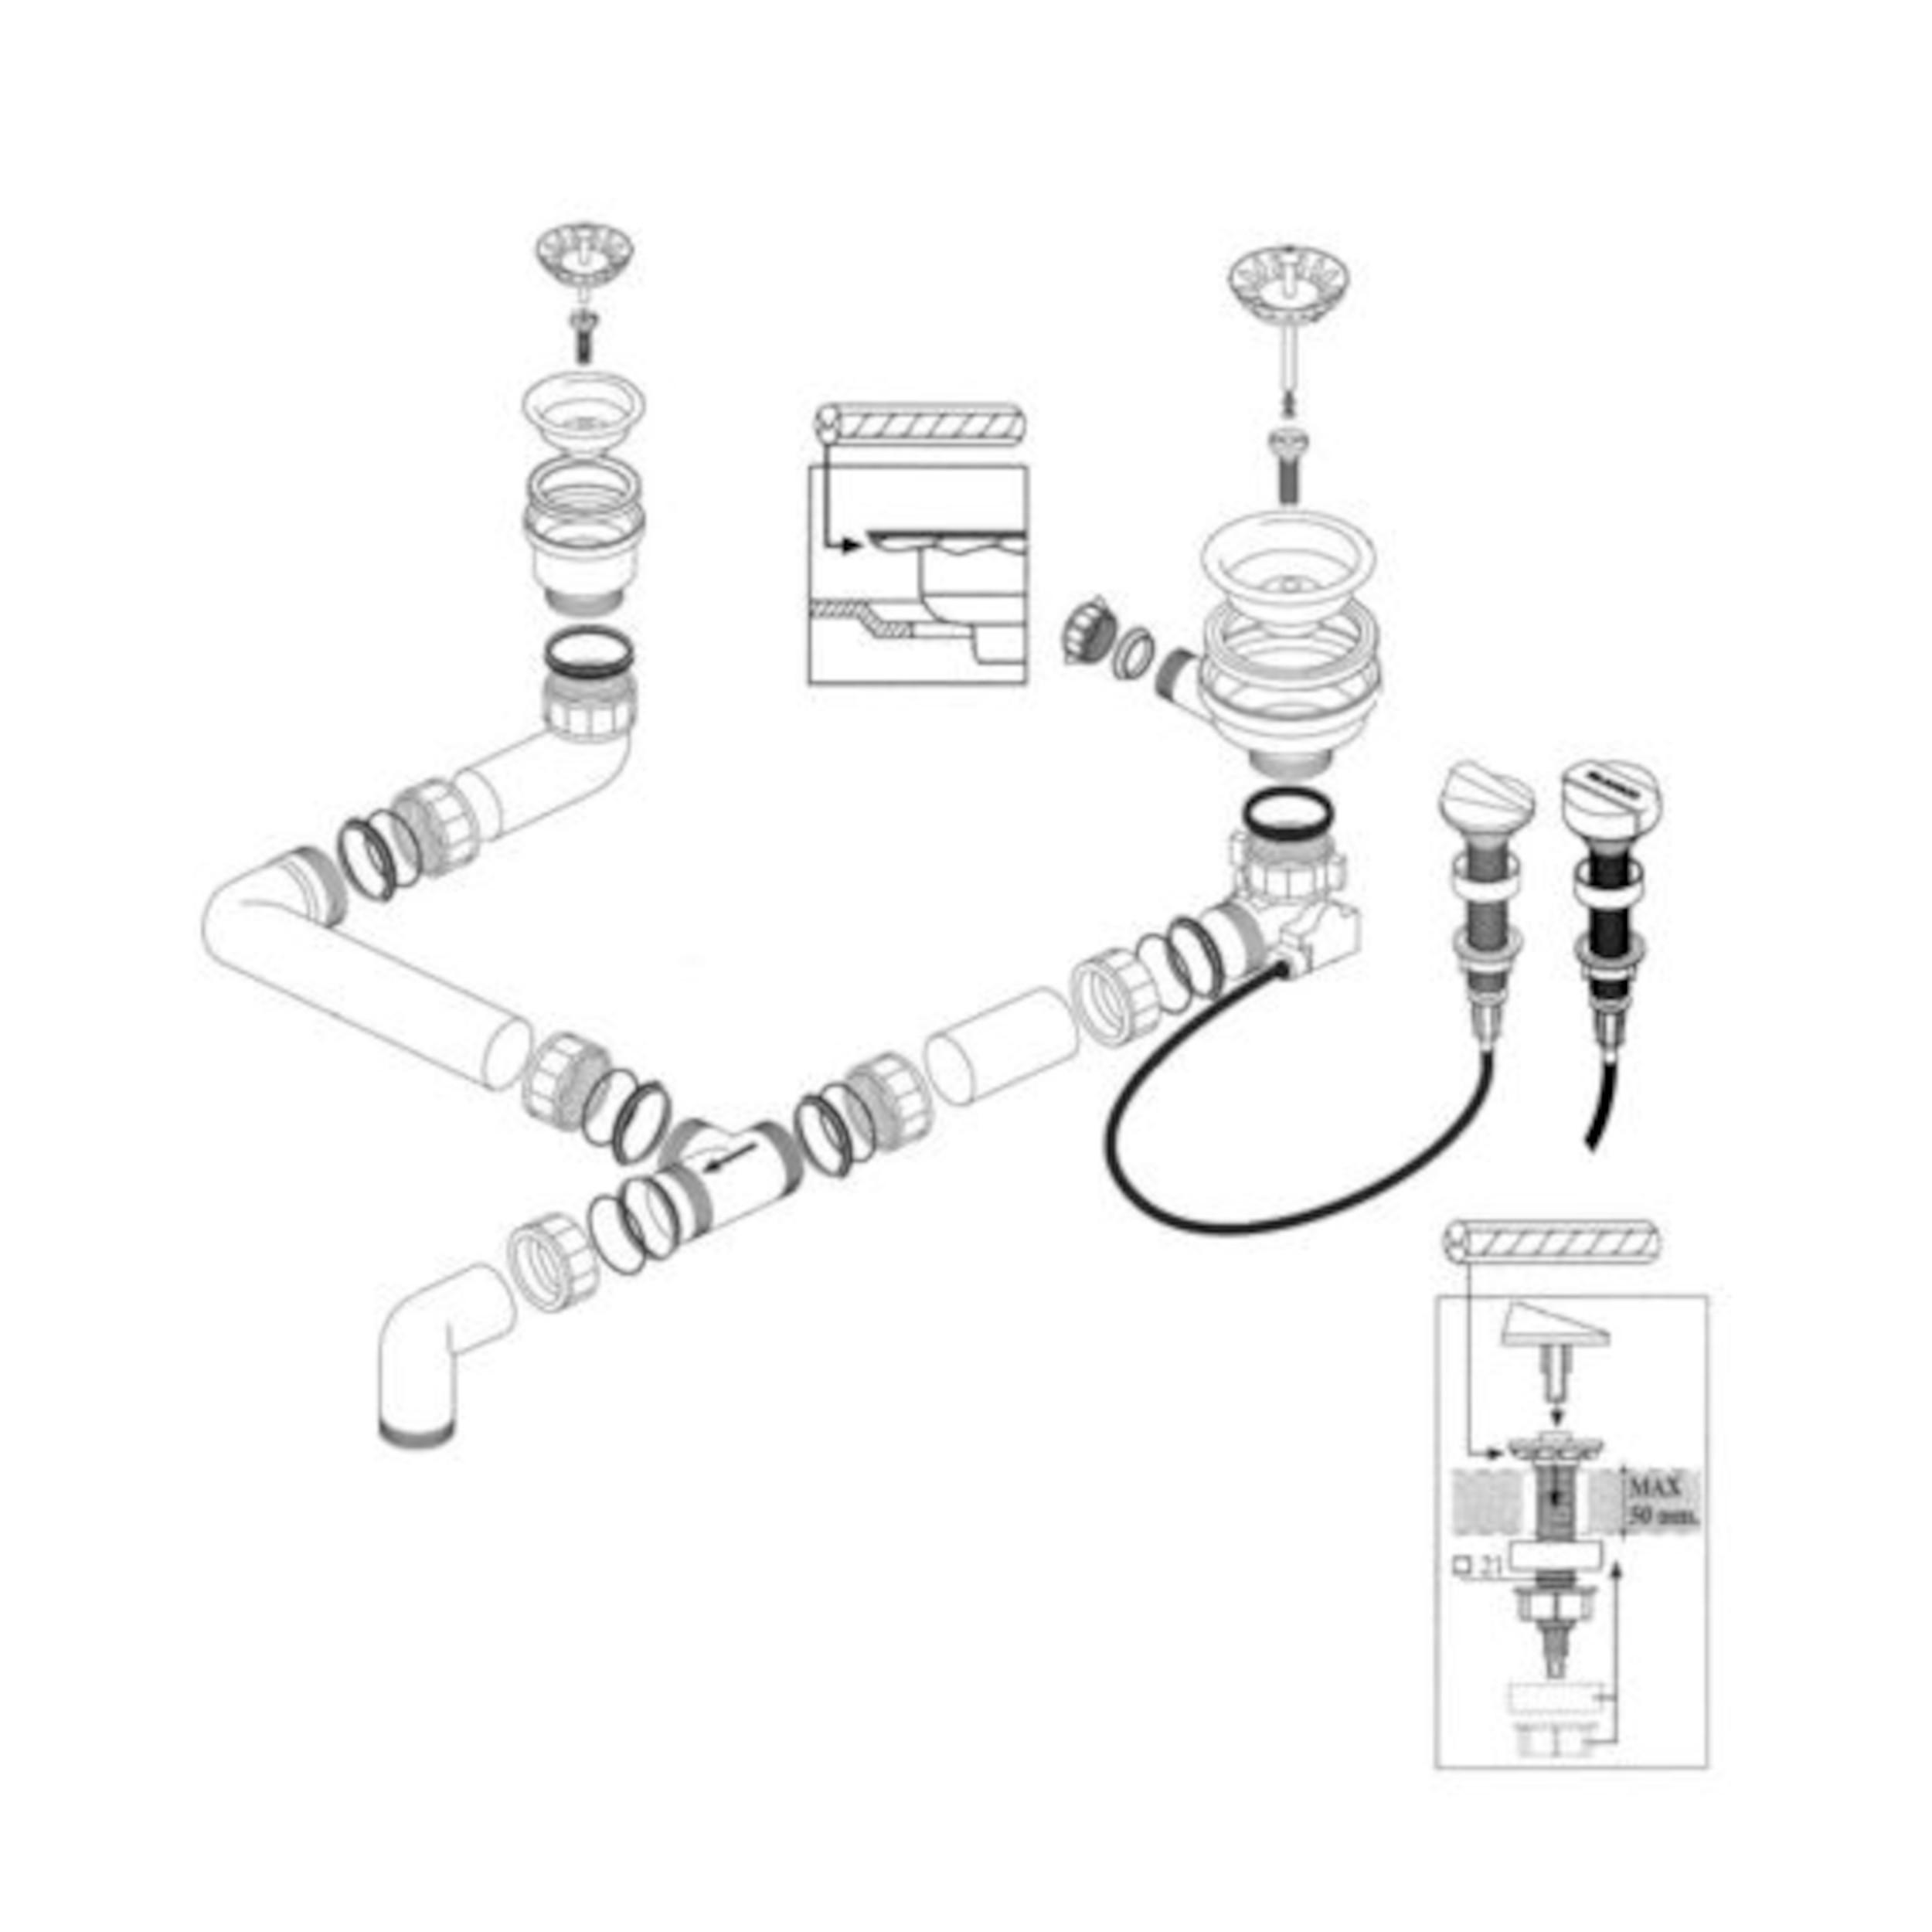 BLANCO Ablaufgarnitur 1 x 3,5'' Sieb - 1 x 1,5'' Sieb Ablauffernbedienung ohne Überlauf 218163